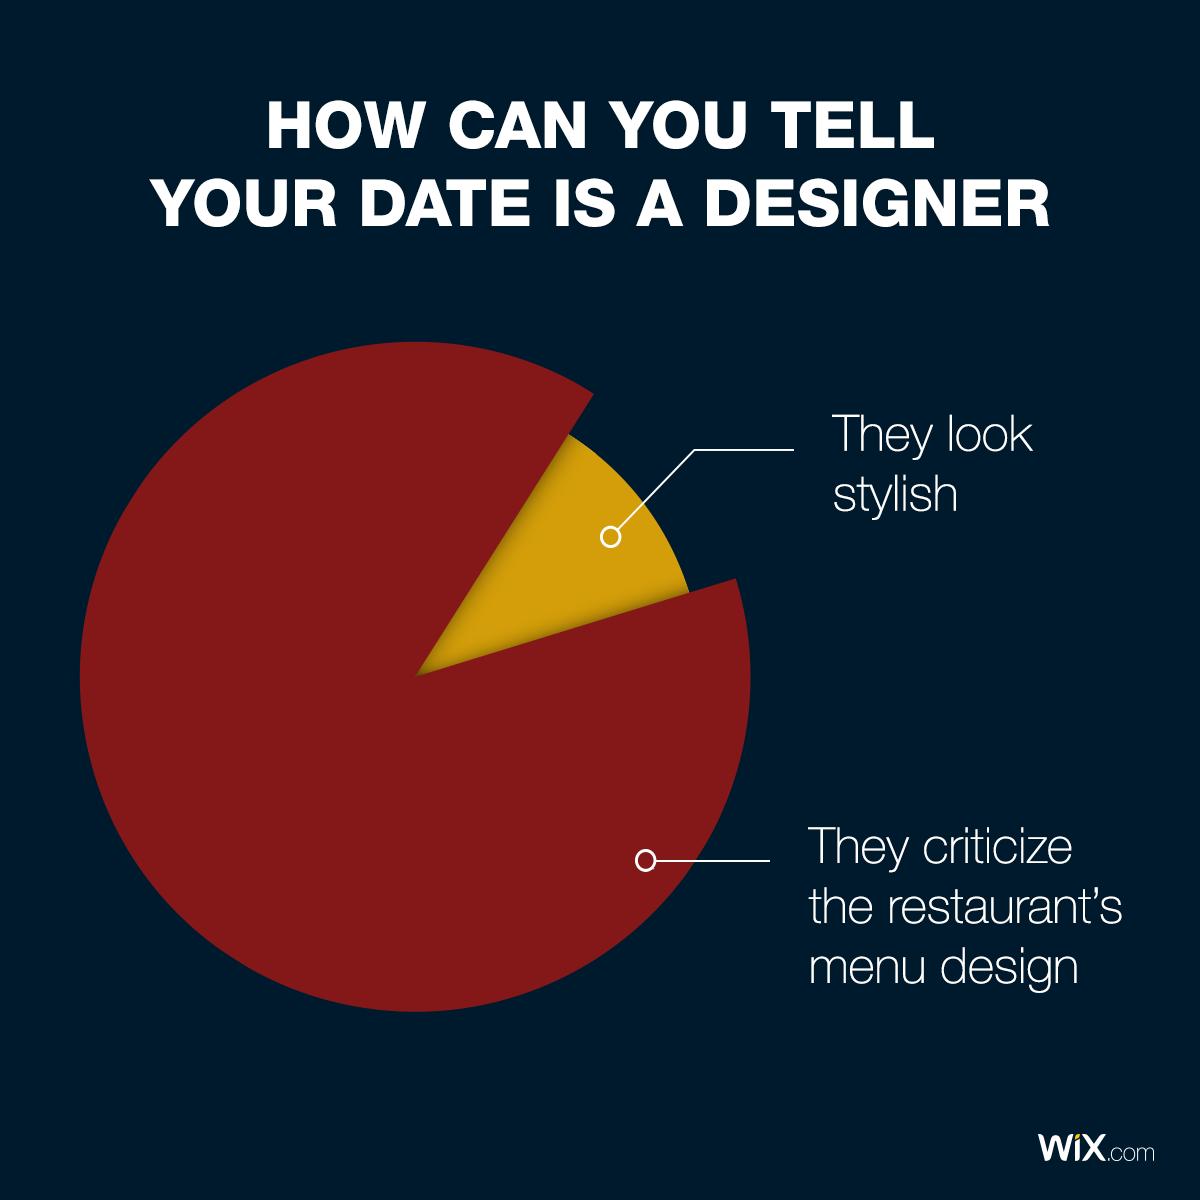 Design Jokes Pie Chart How Can You Tell Your Date Is A Designer Business Design Restaurant Menu Design Menu Design